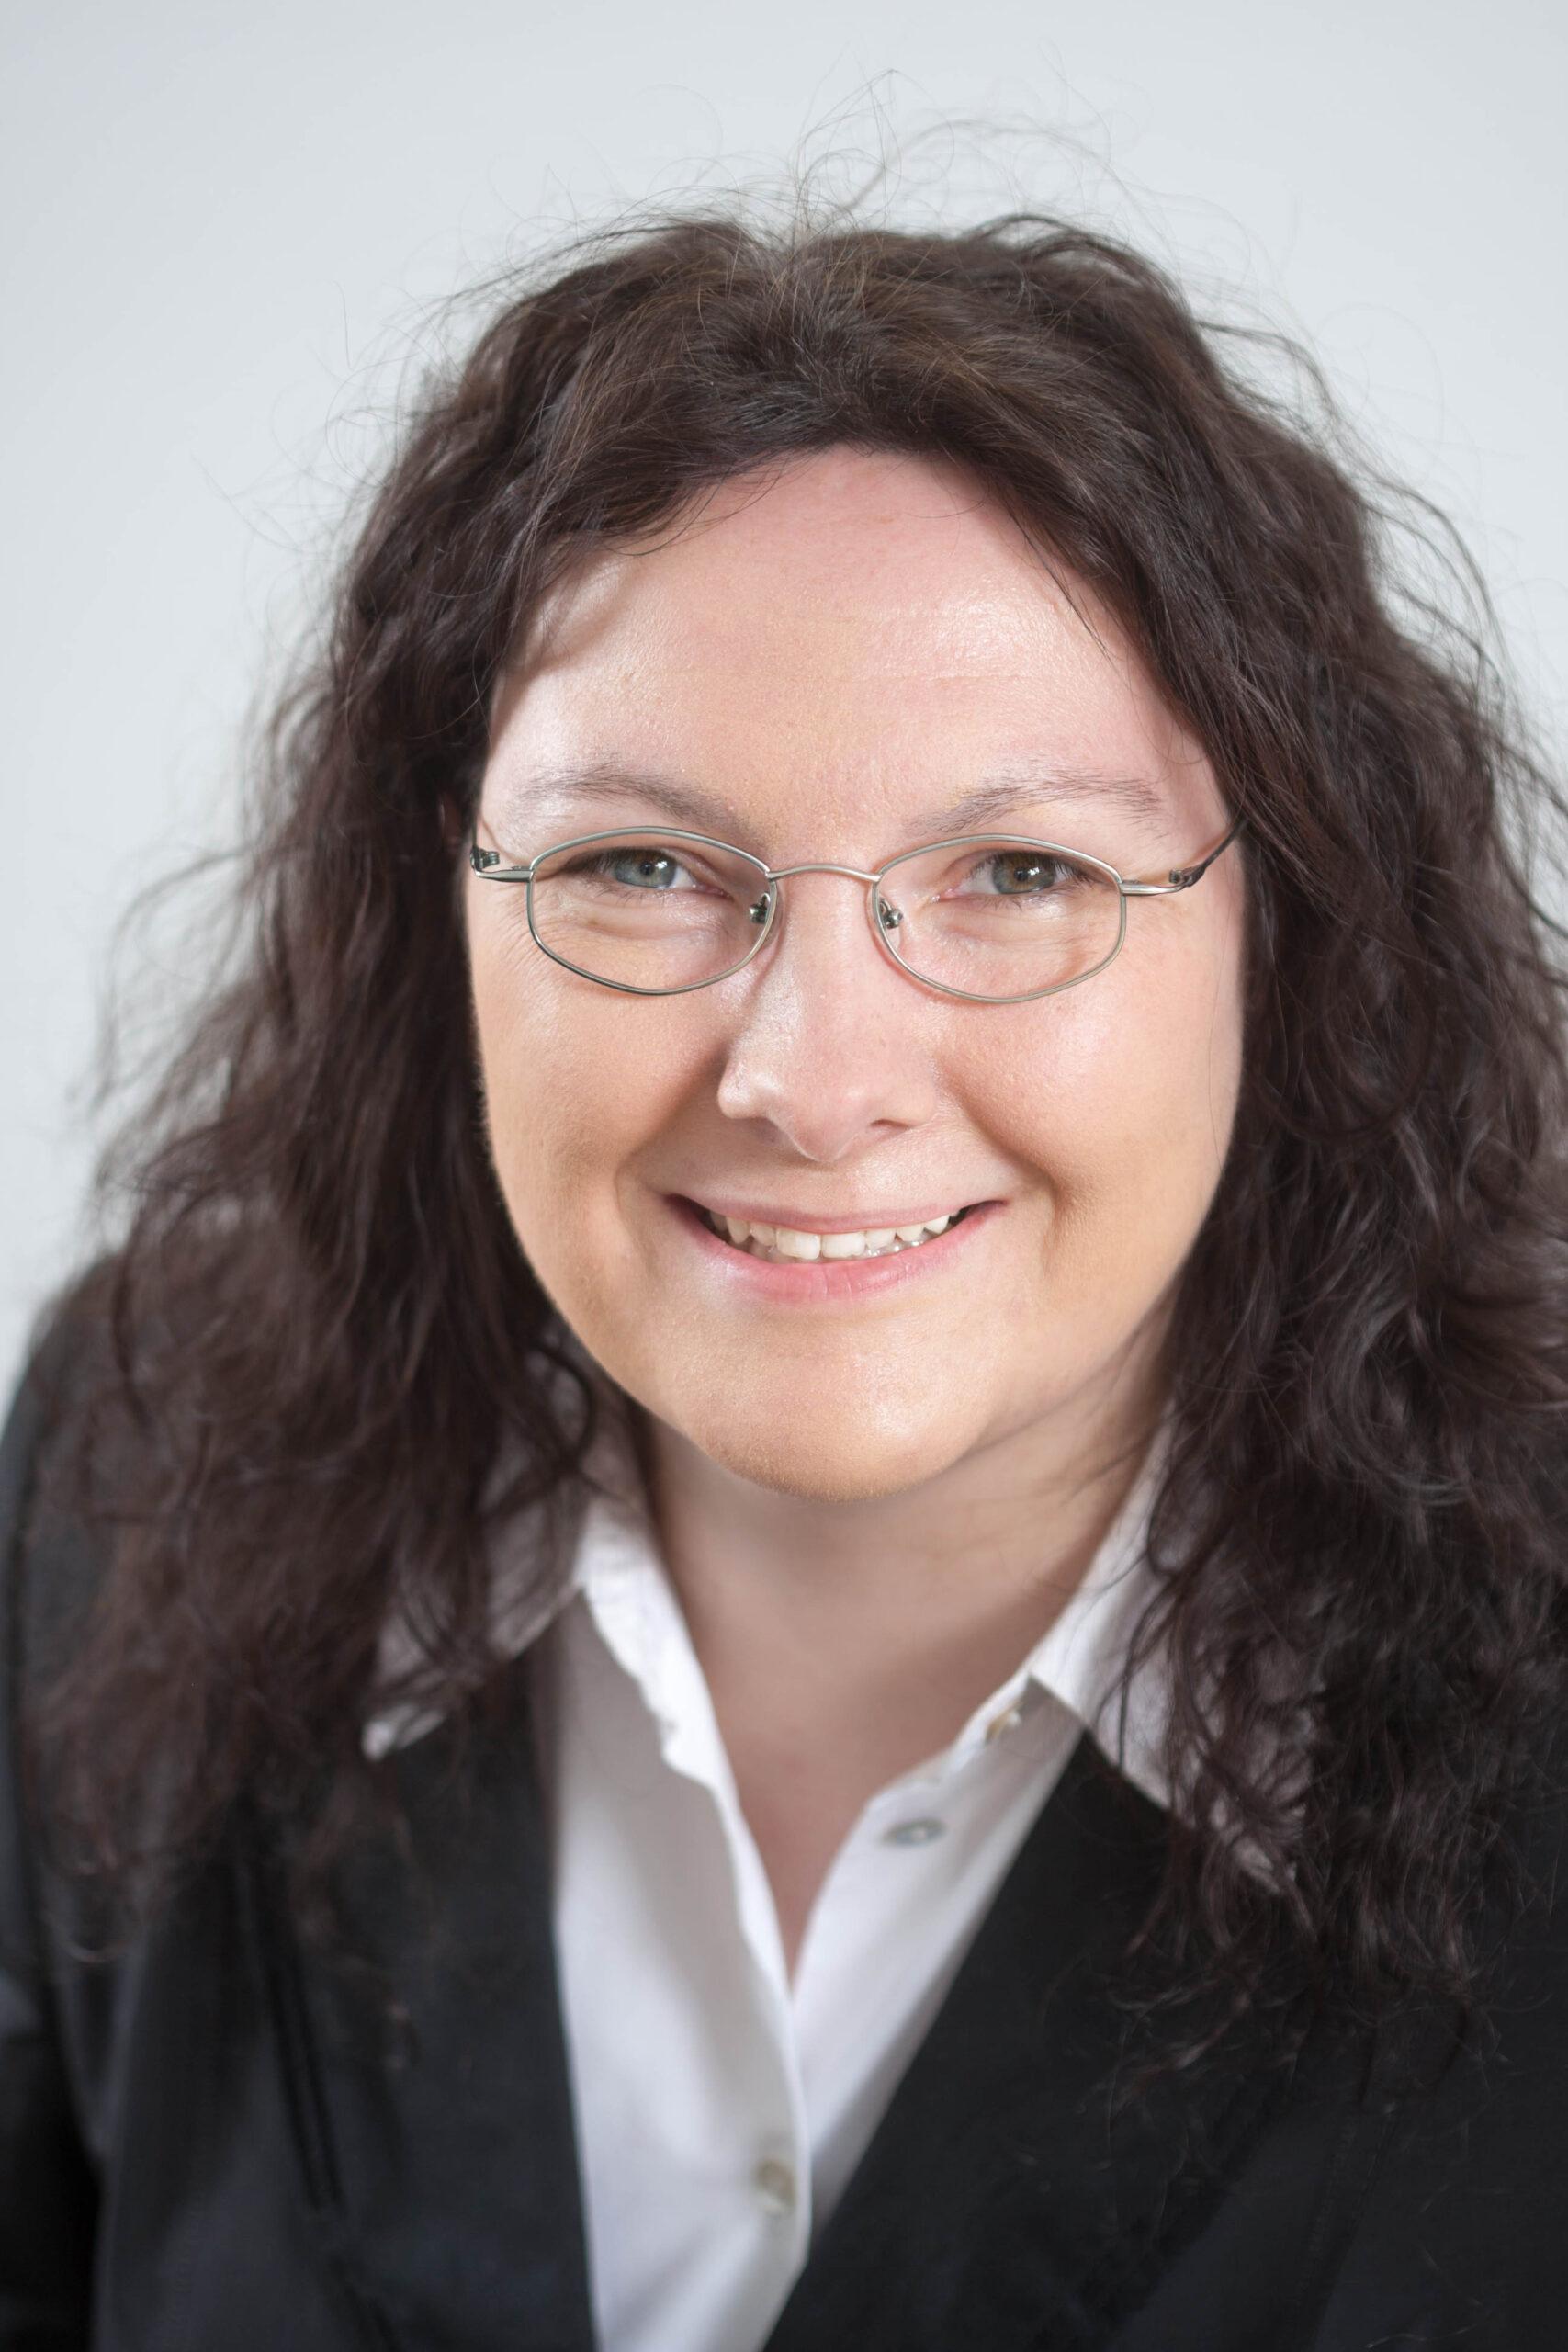 Anke Seidelmann-Diemel